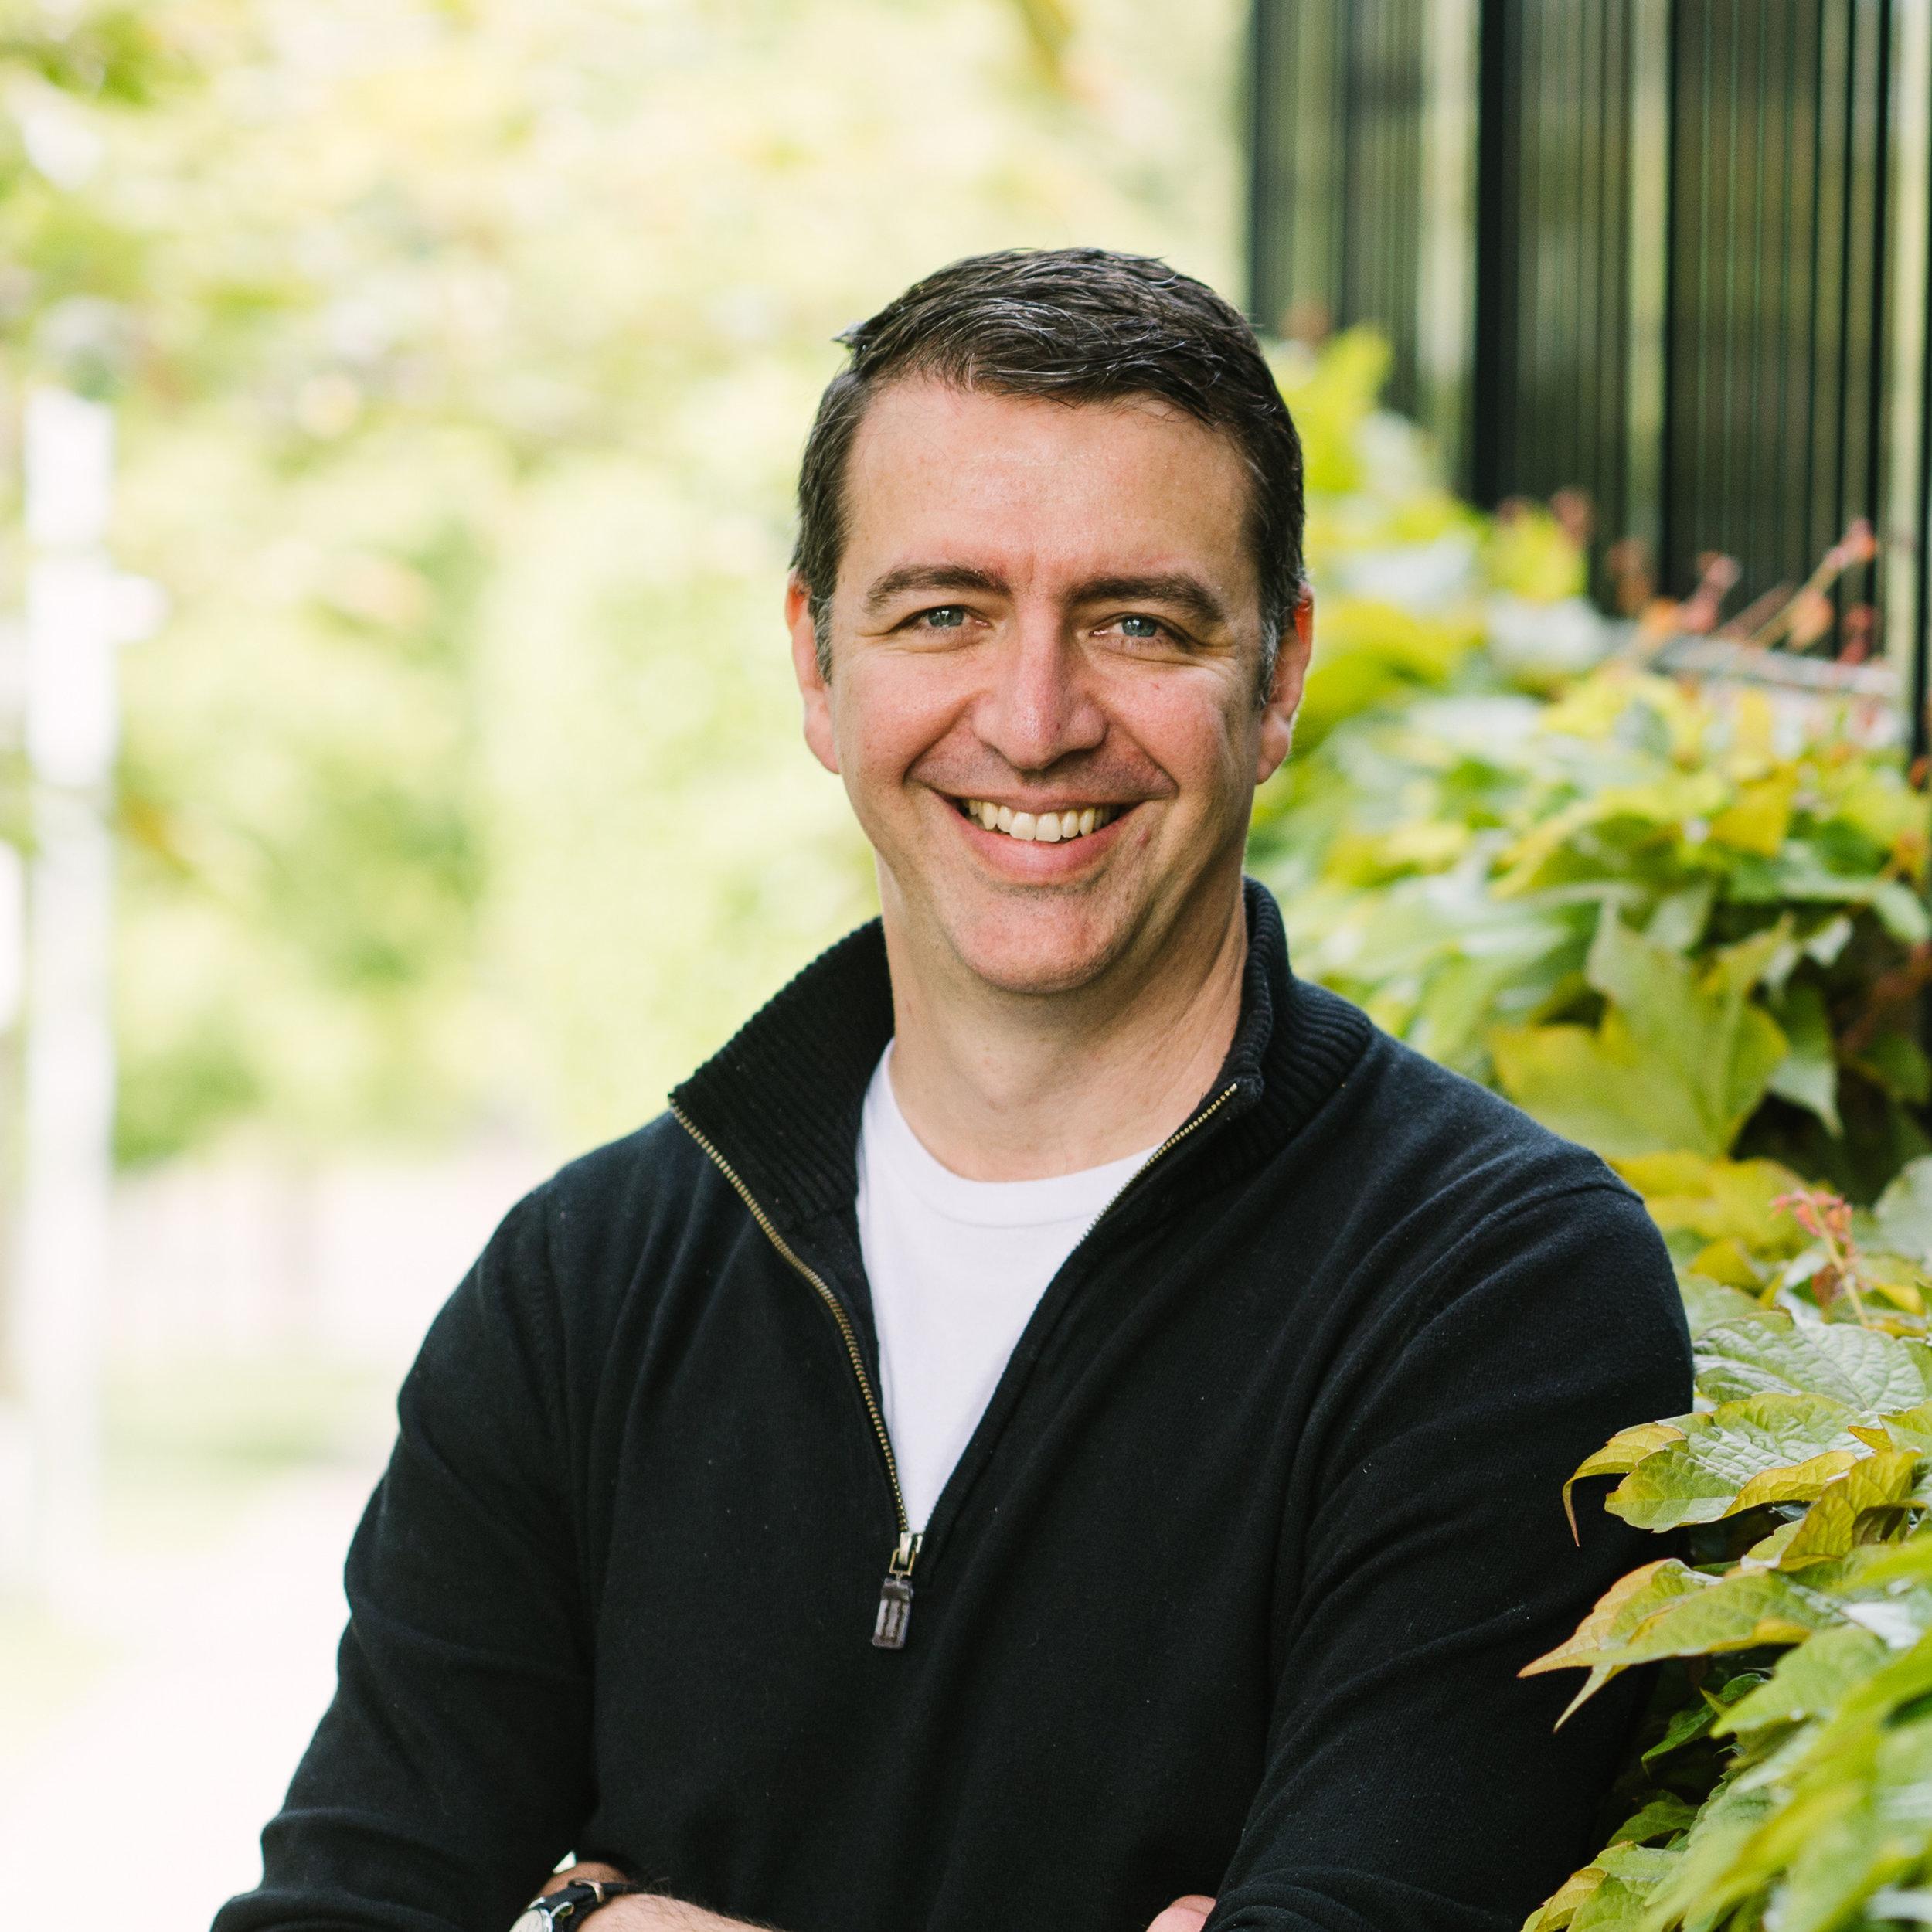 Dave Nelson - Career Development, Podcast producer